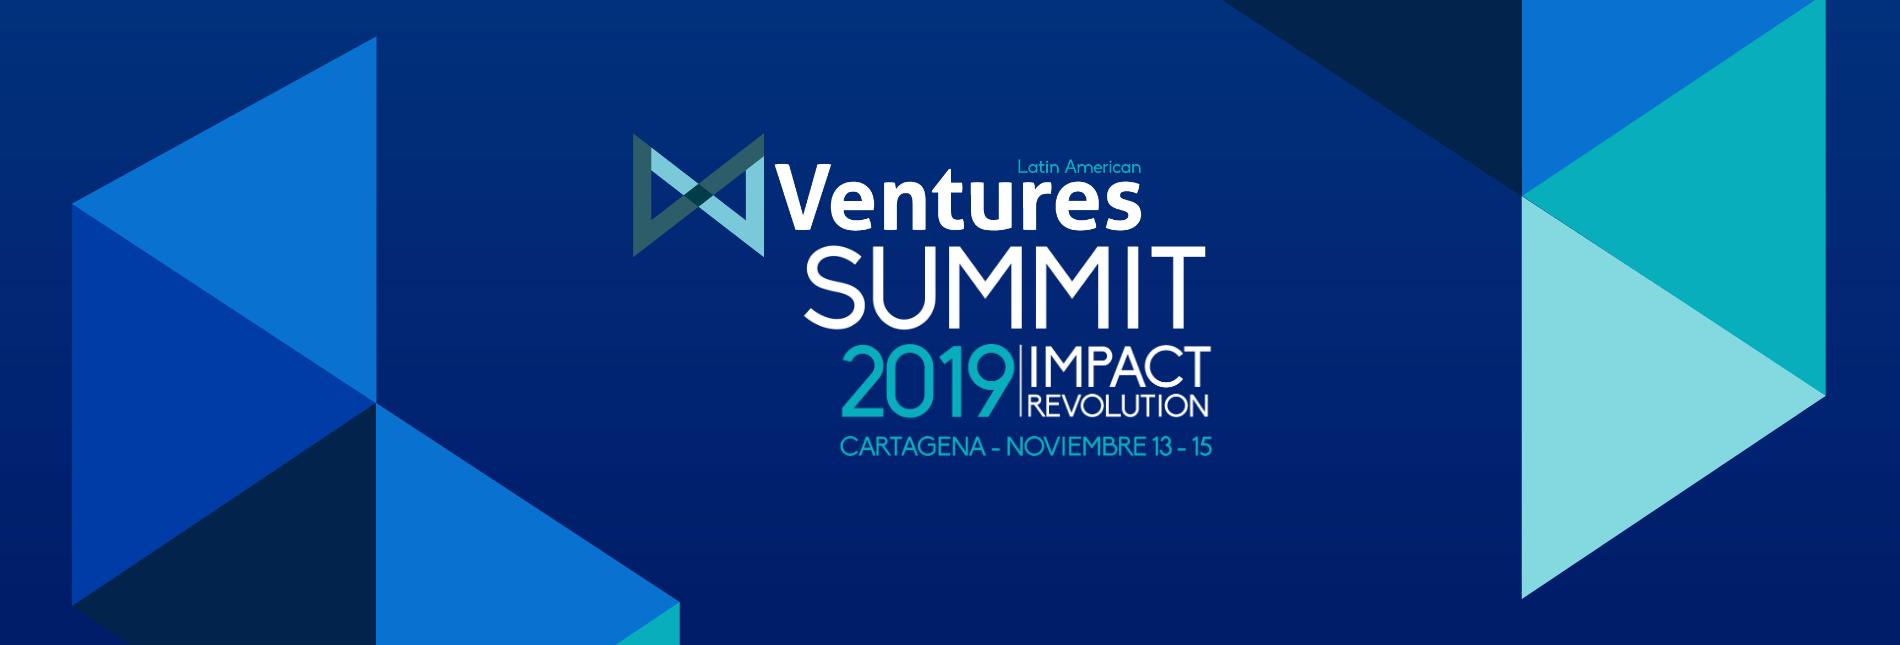 Ventures_summit___ventures_summit_2019